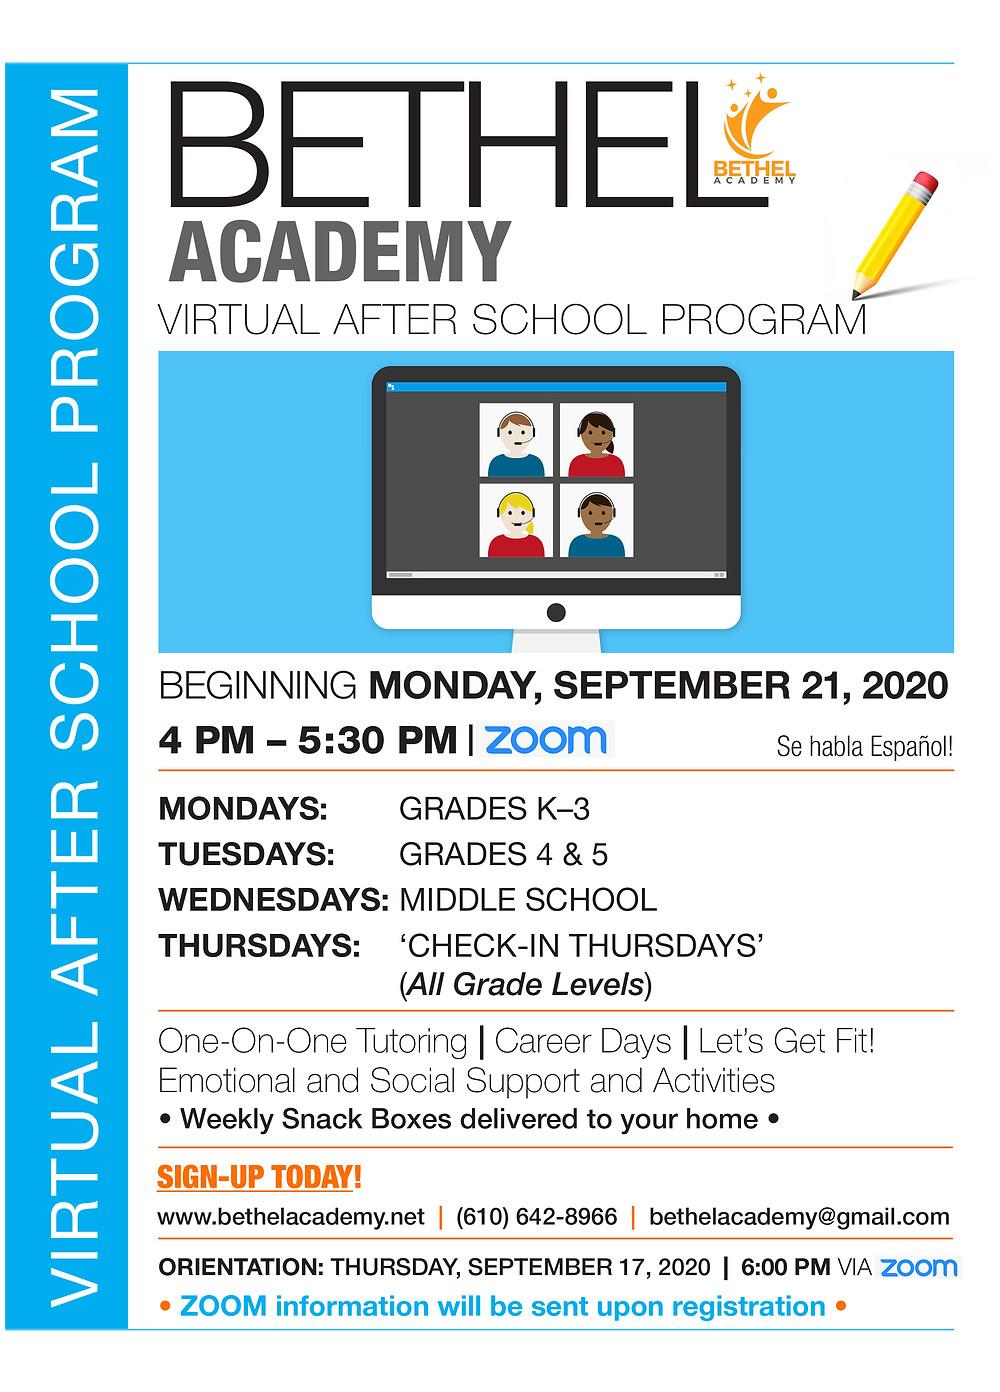 2020-2021 Bethel Academy Virtual After School Program Sign Up!